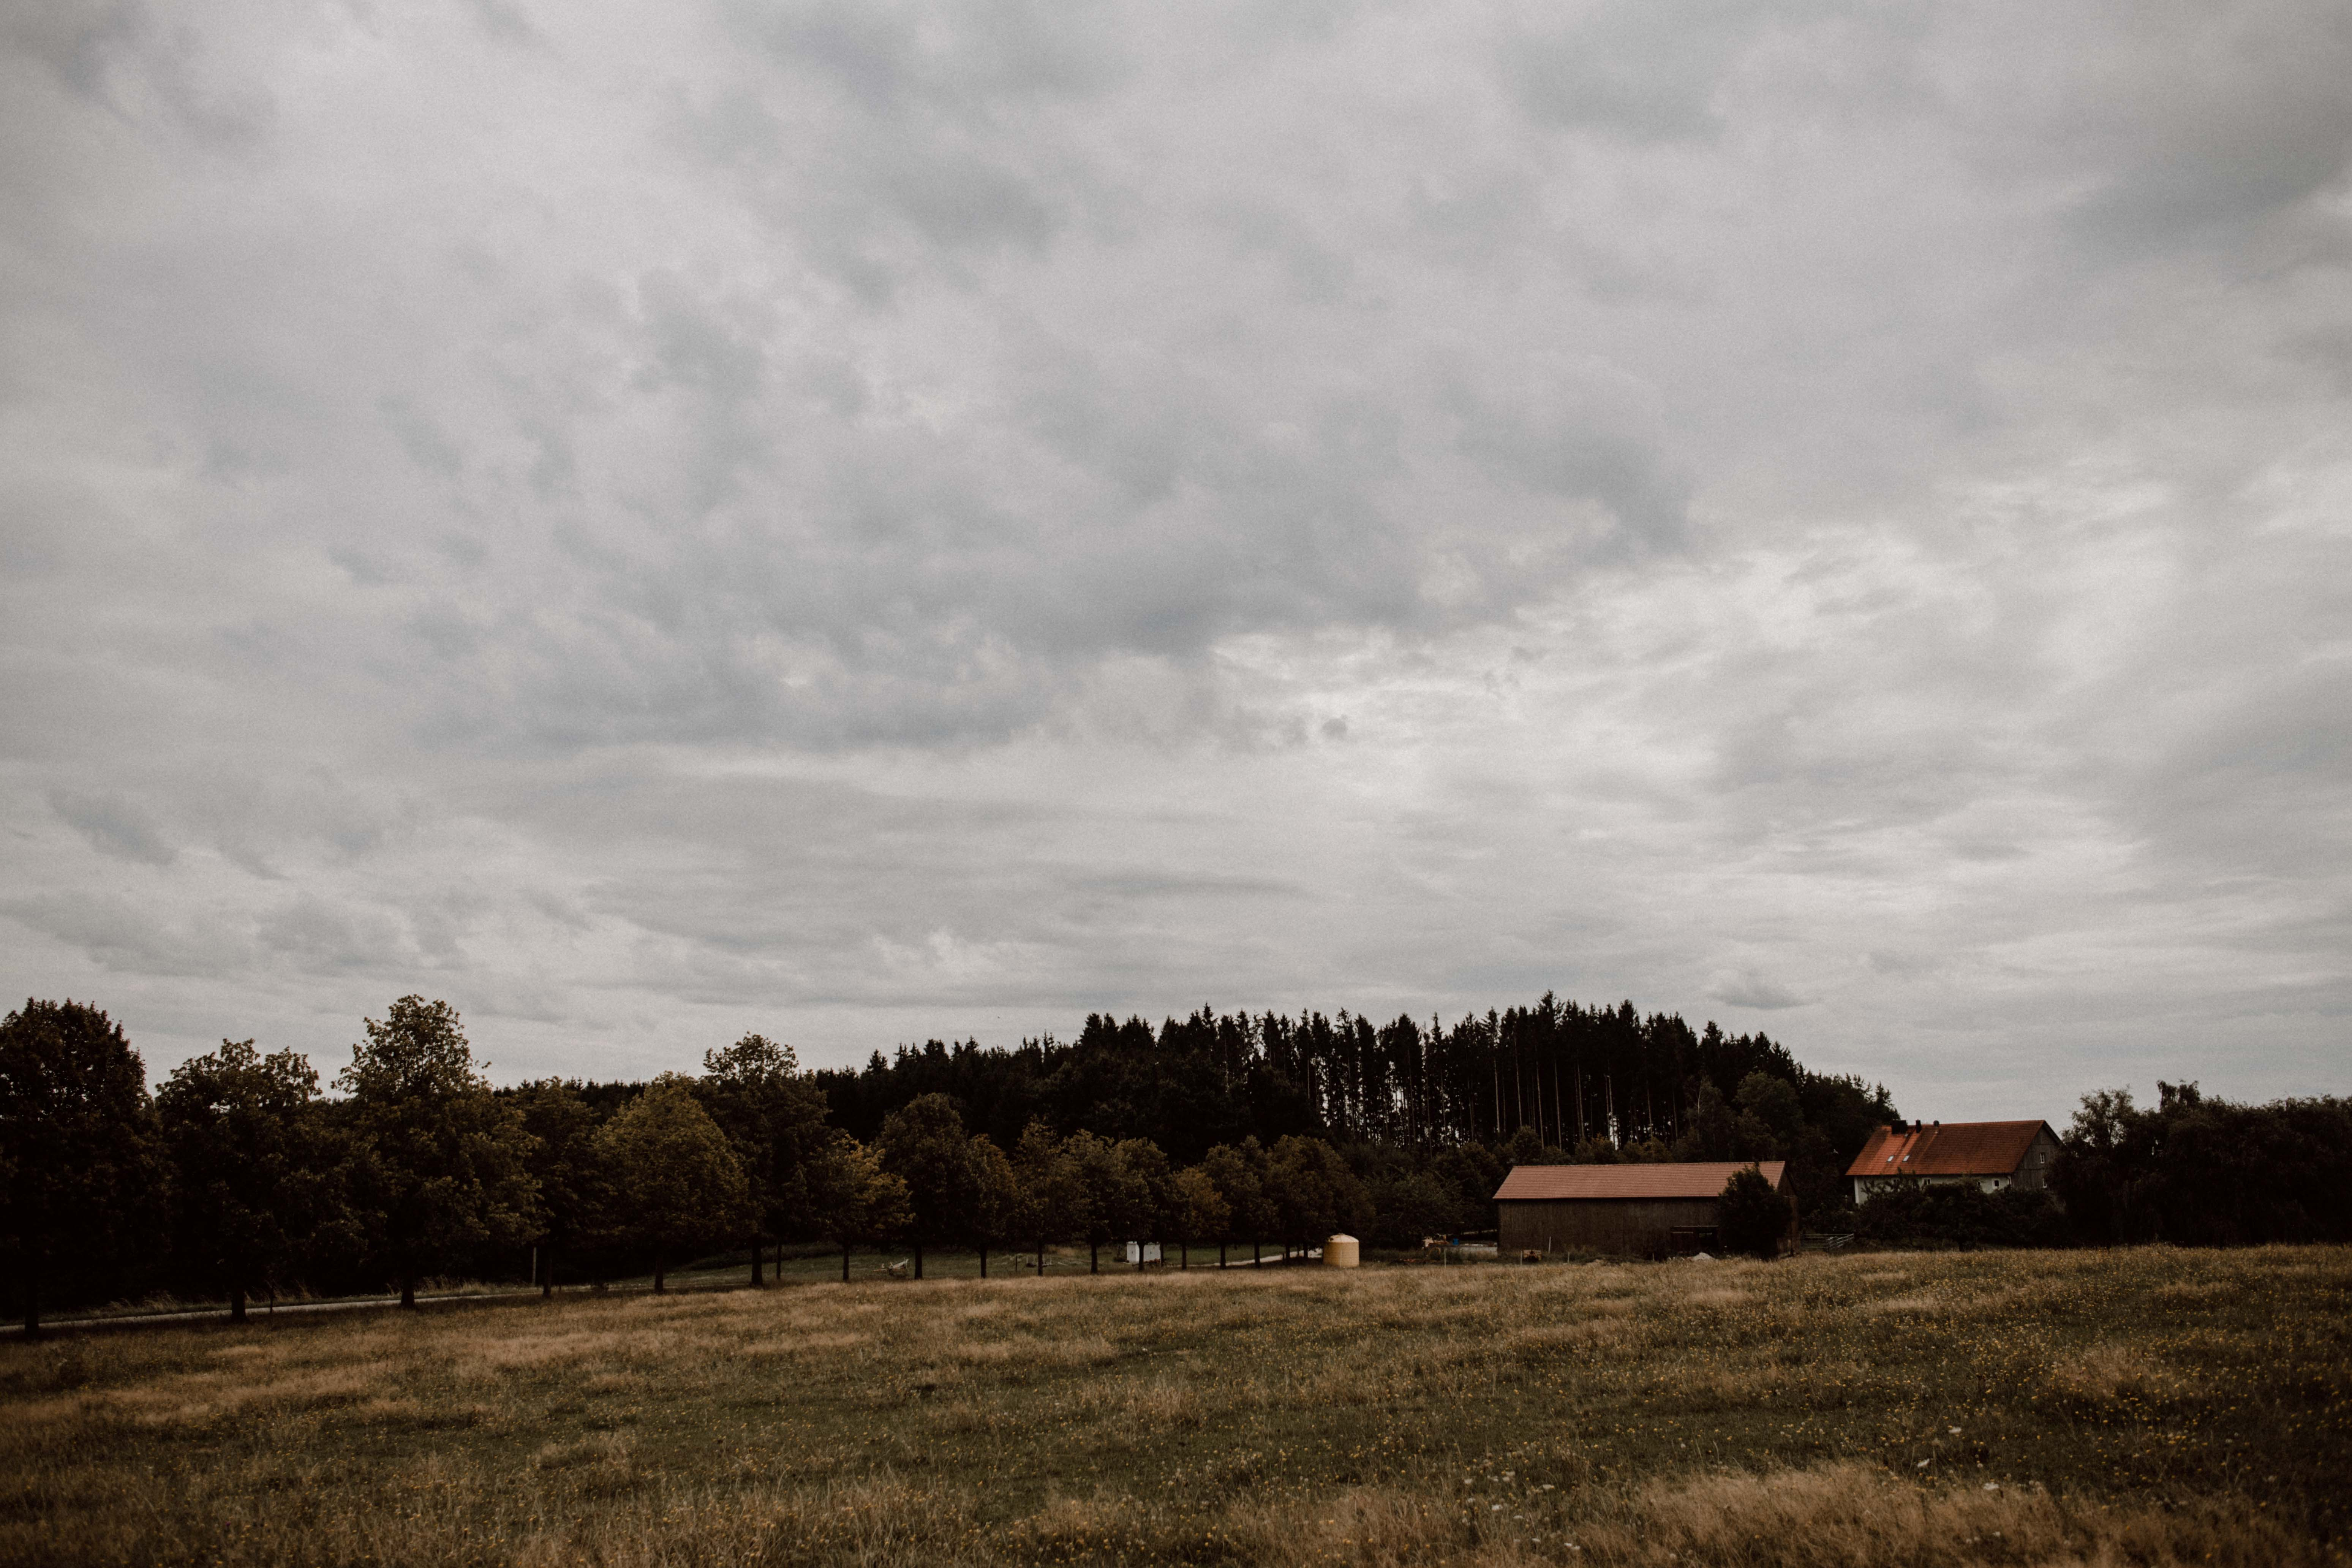 landschaft obermarchenbach sonja poehlmann photography couples muenchen bayern